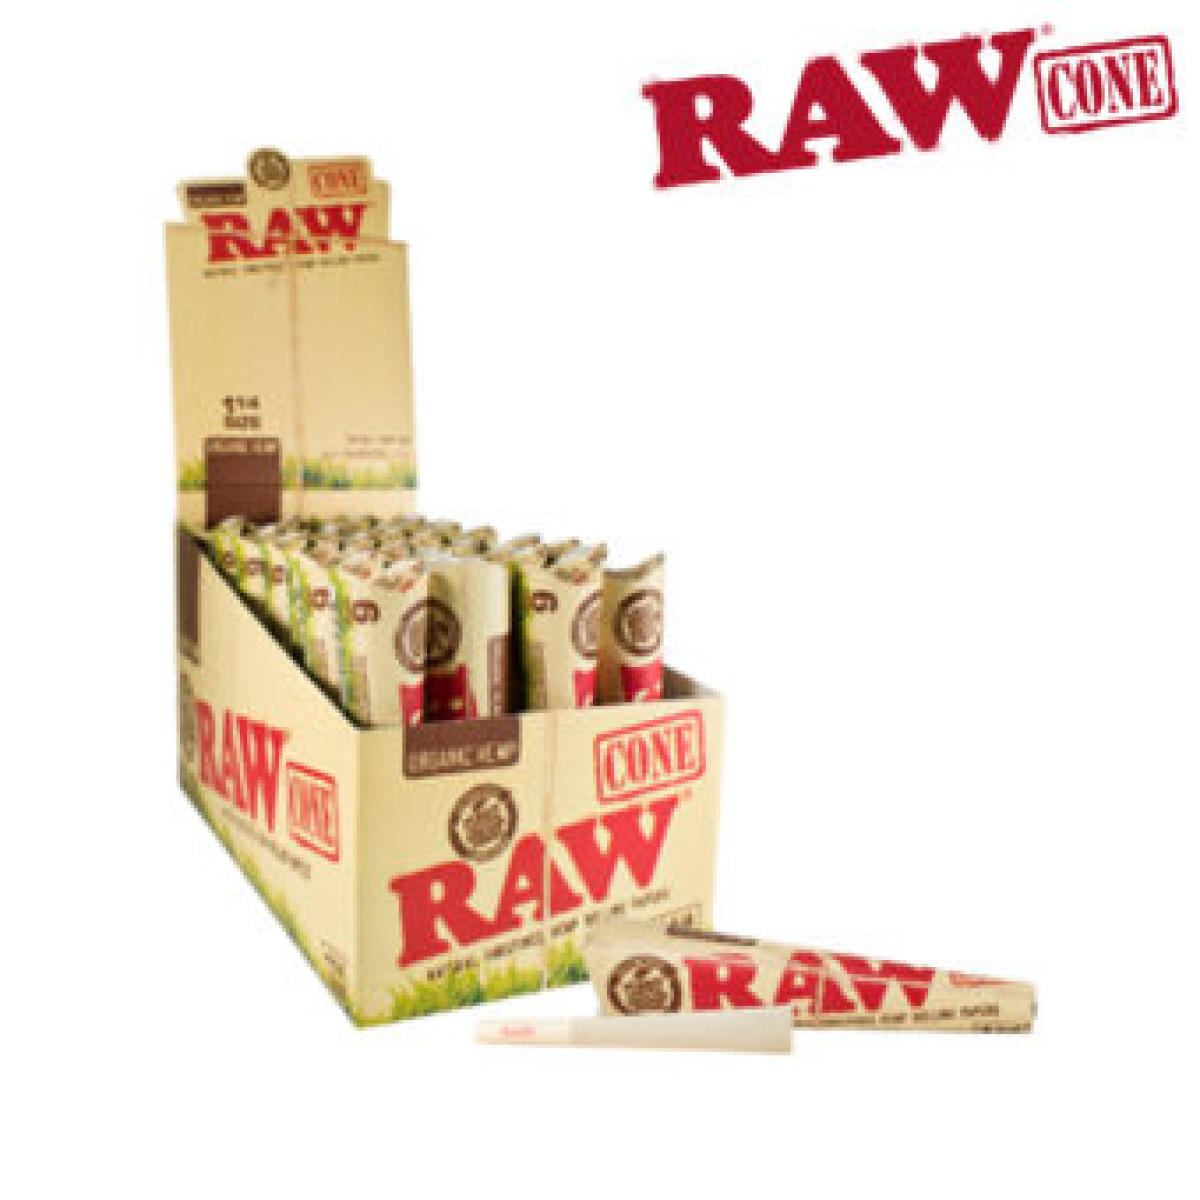 RAW ORGANIC PRE-ROLLED CONE 1¼